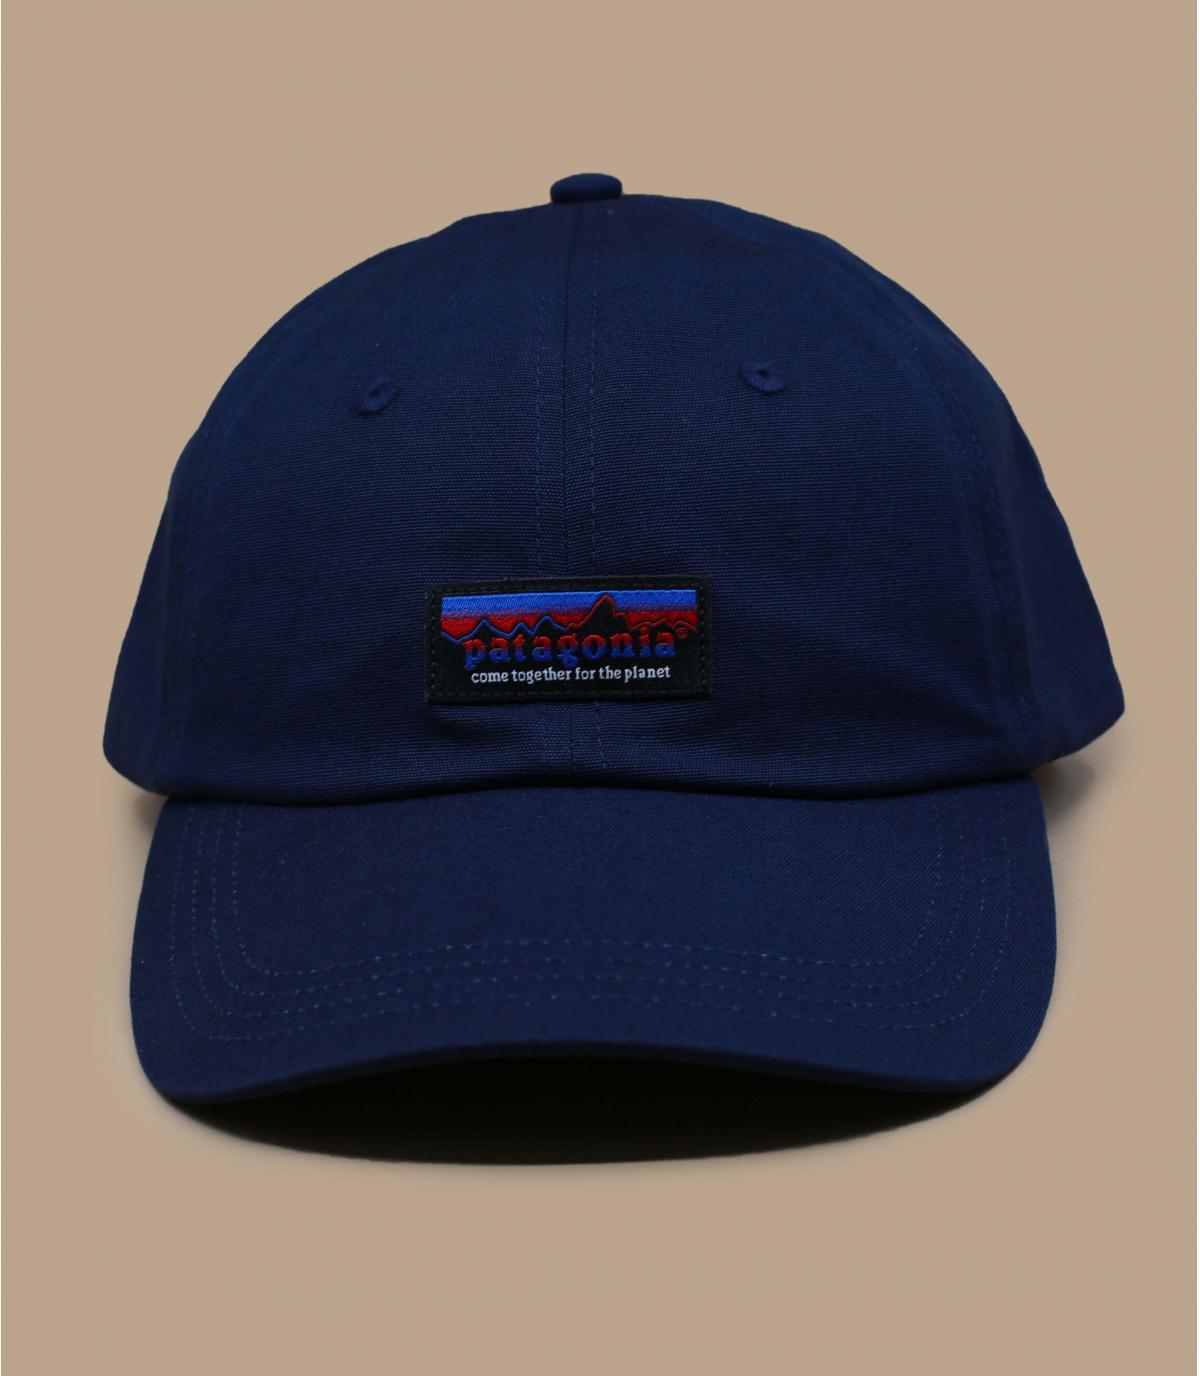 Cappellino blu marino Patagonia